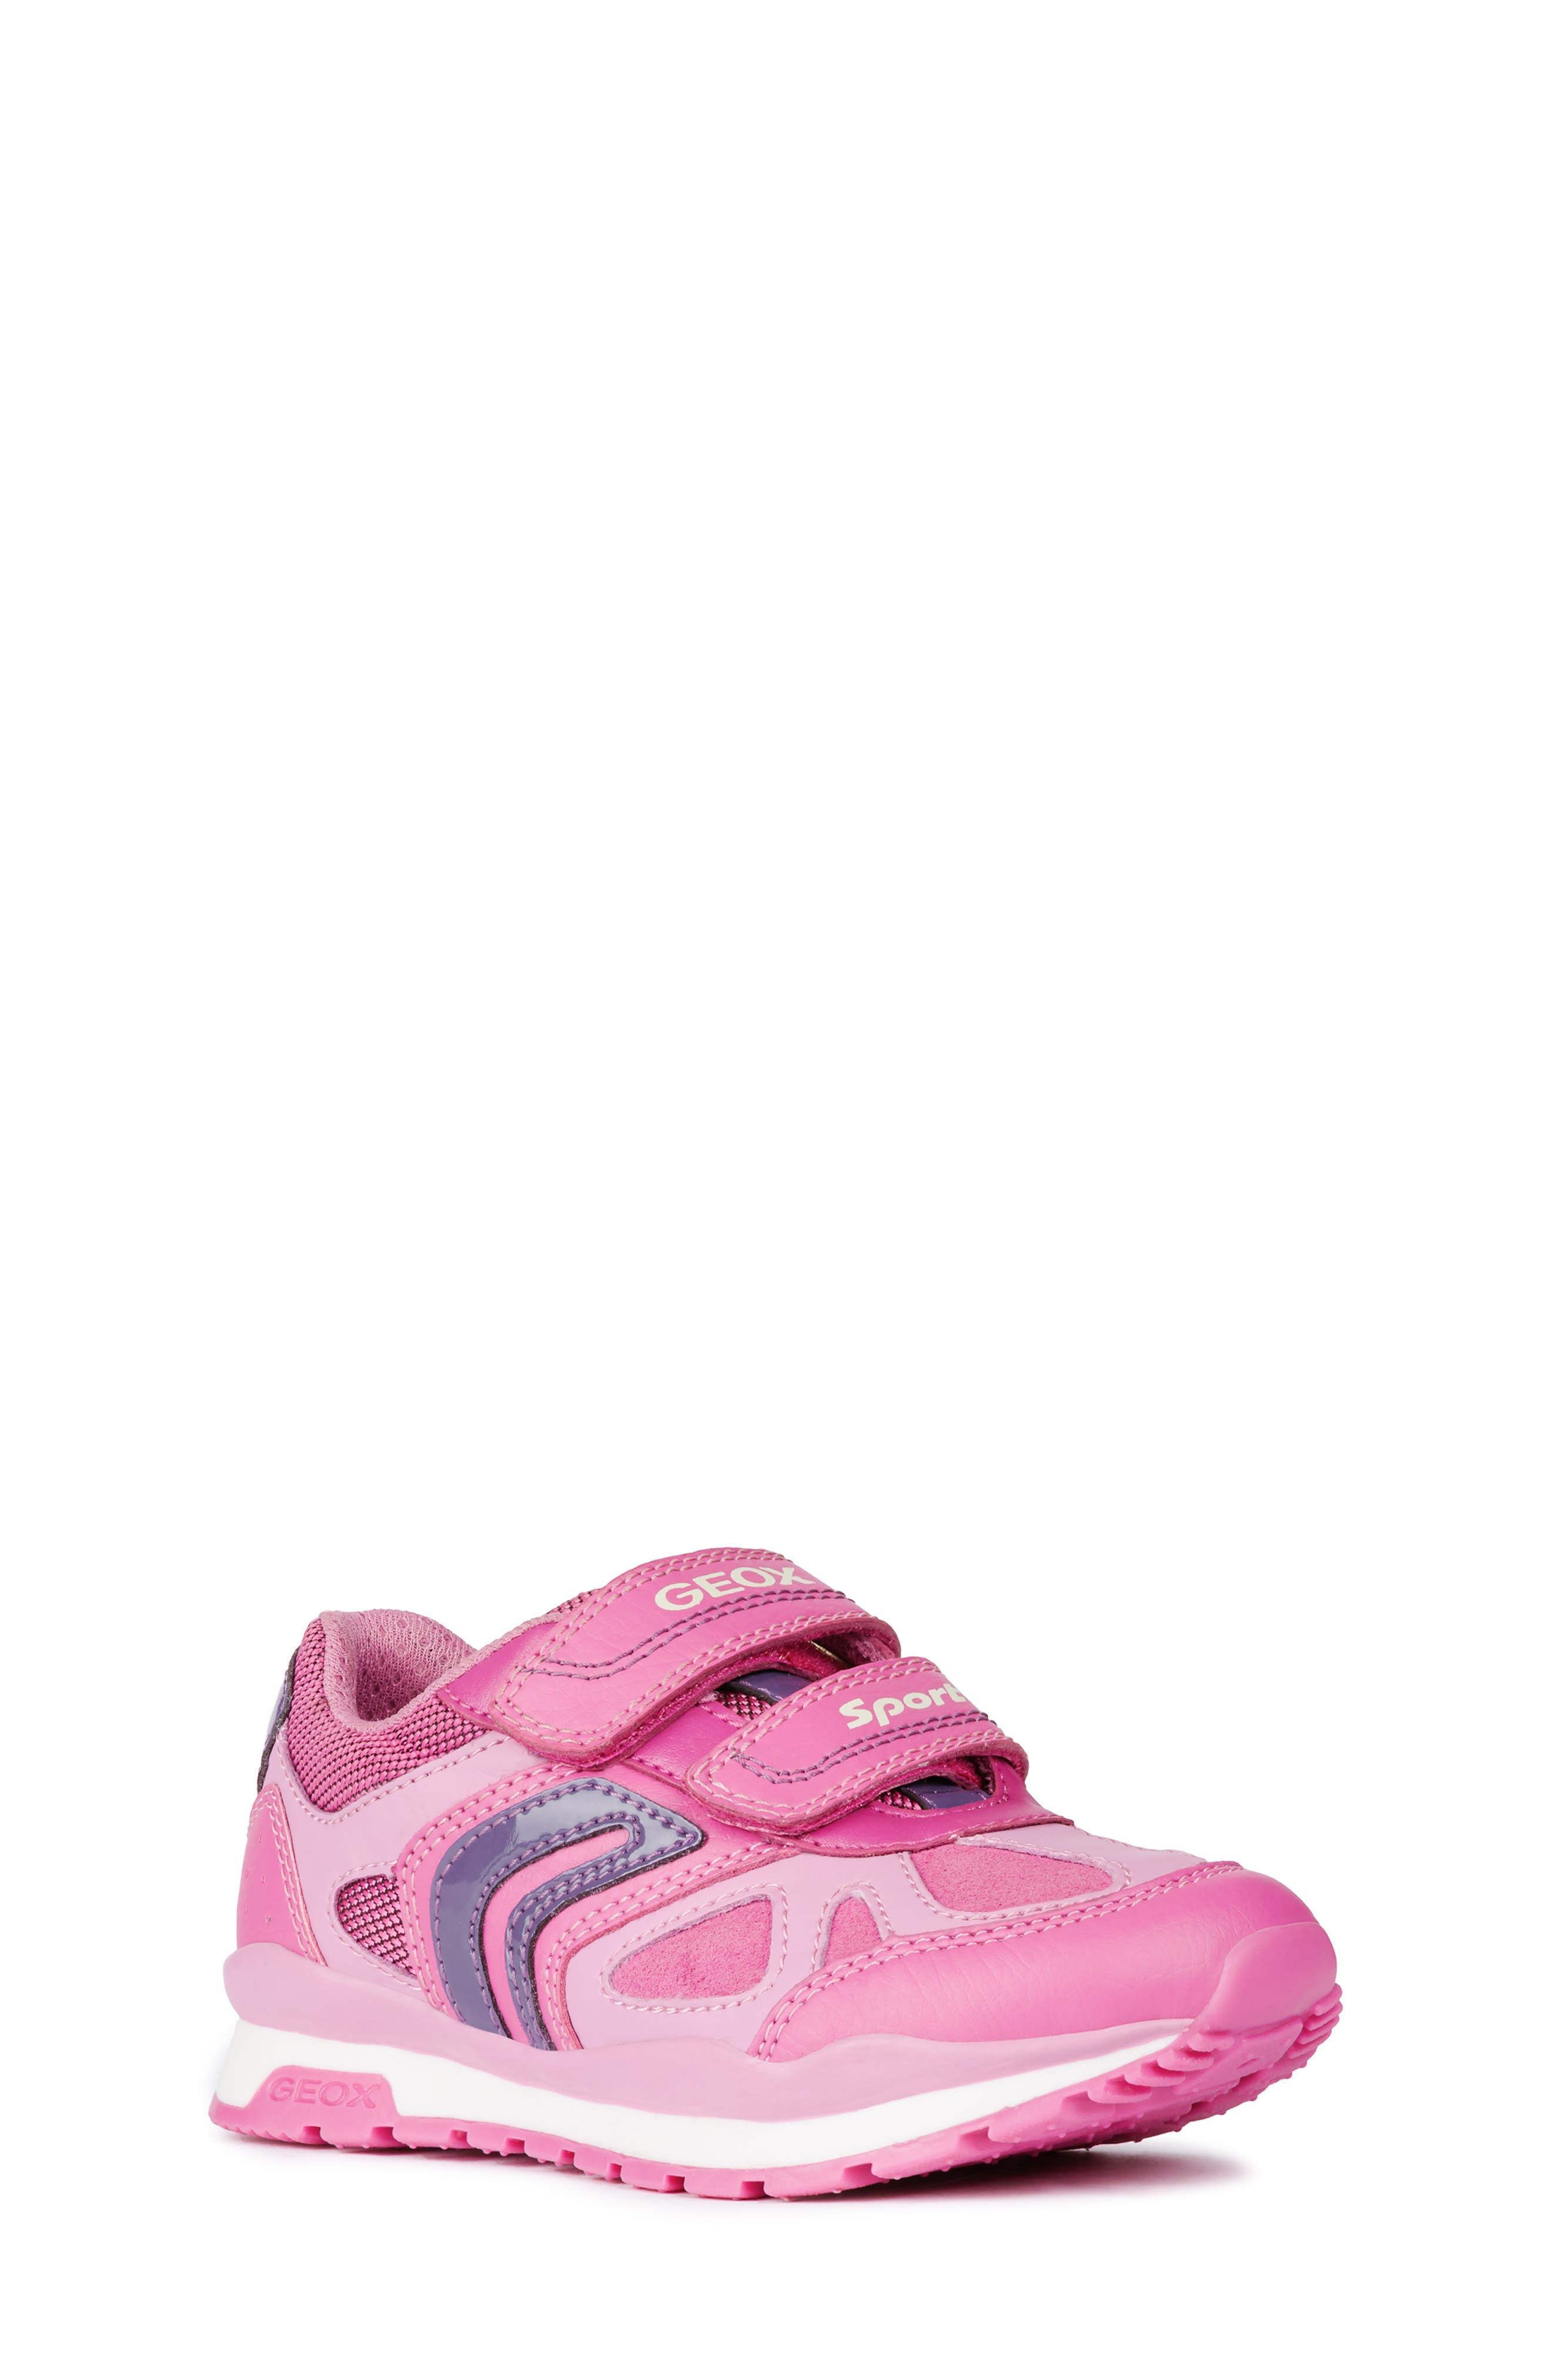 Pavel Sneaker,                             Main thumbnail 1, color,                             FUCHSIA/PINK